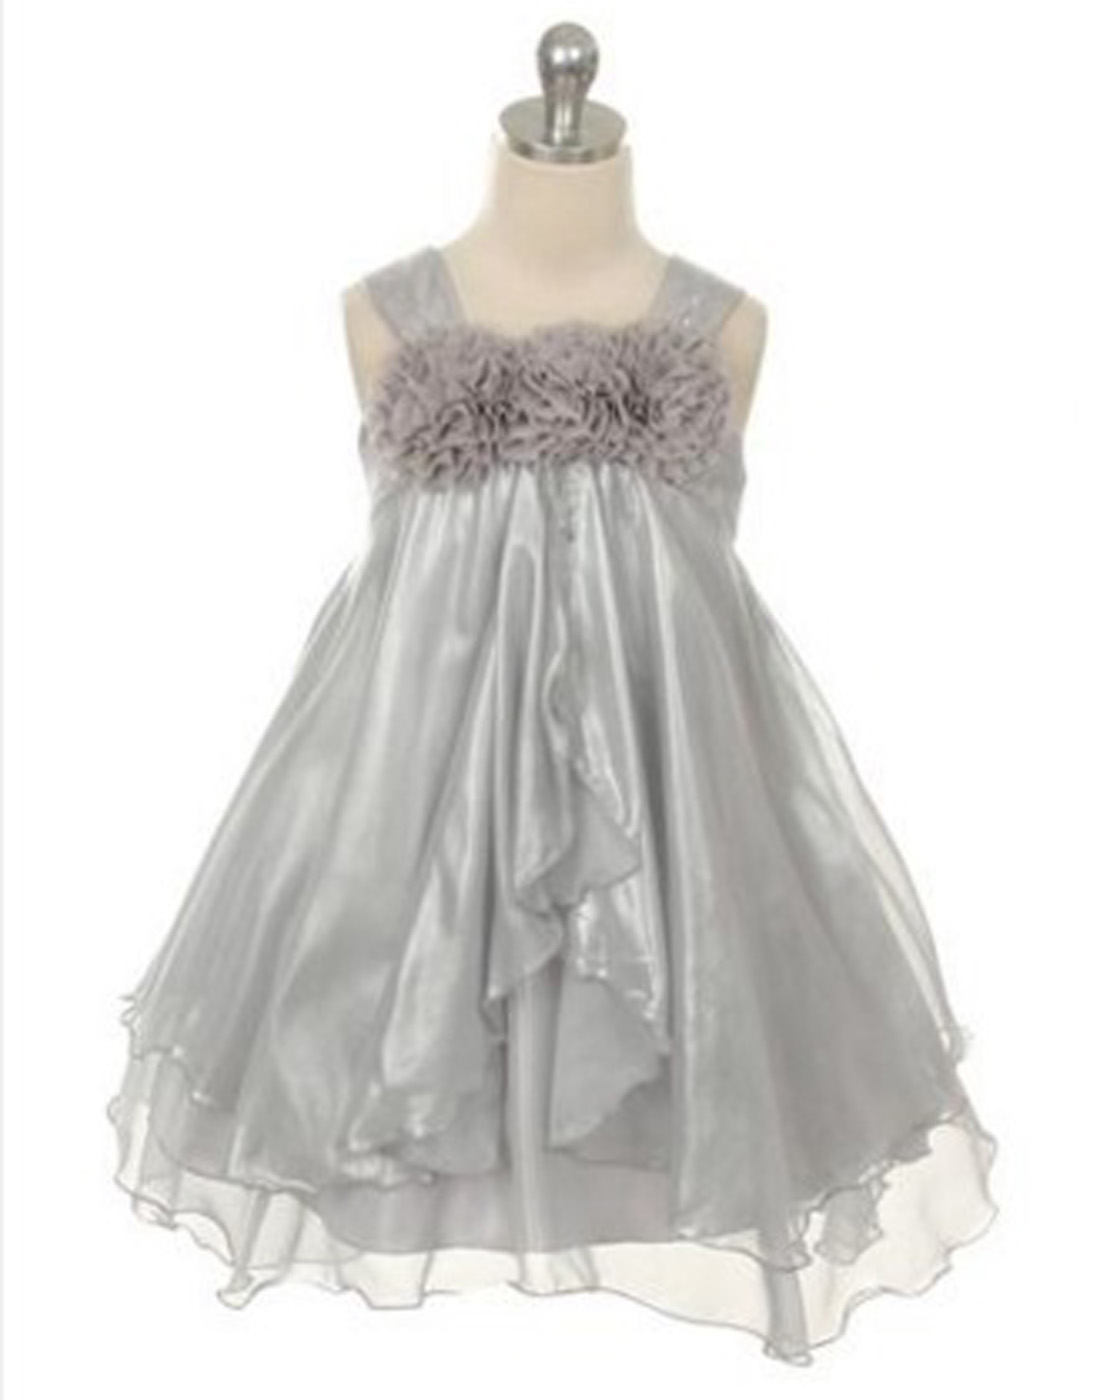 Shimmery Chiffon Flower Girl Dress Wedding Party Dress Special